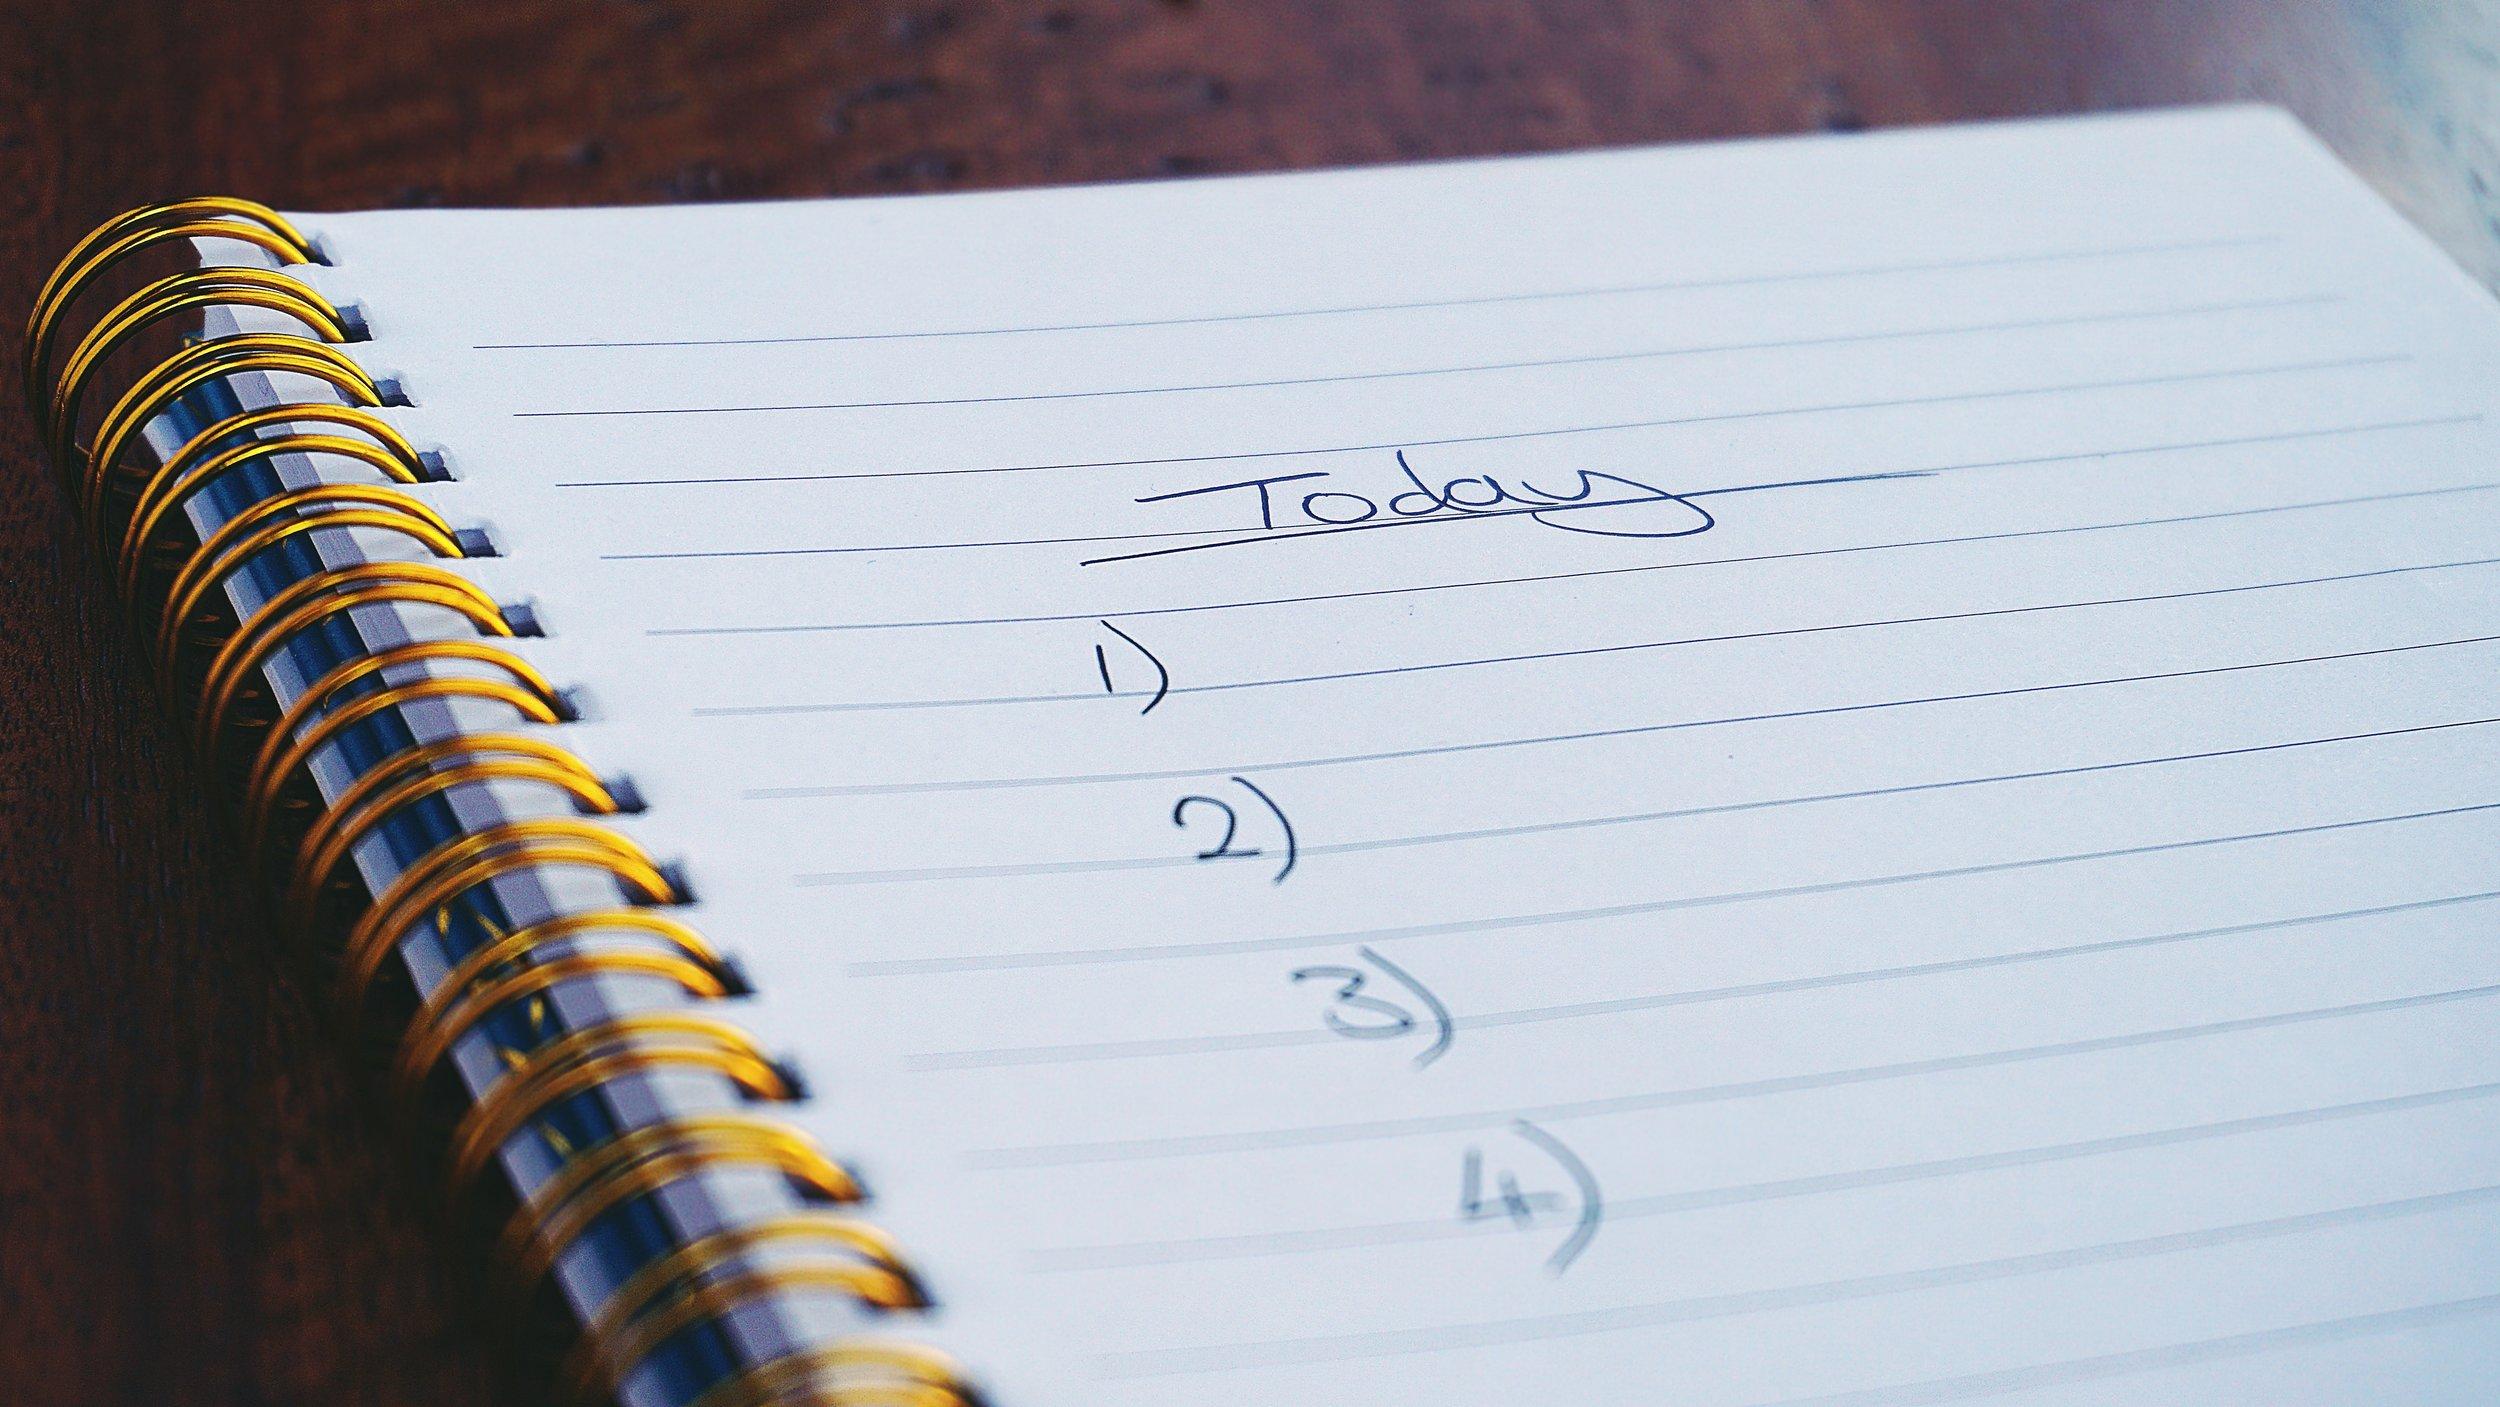 checklist-composition-handwriting-1226398.jpg